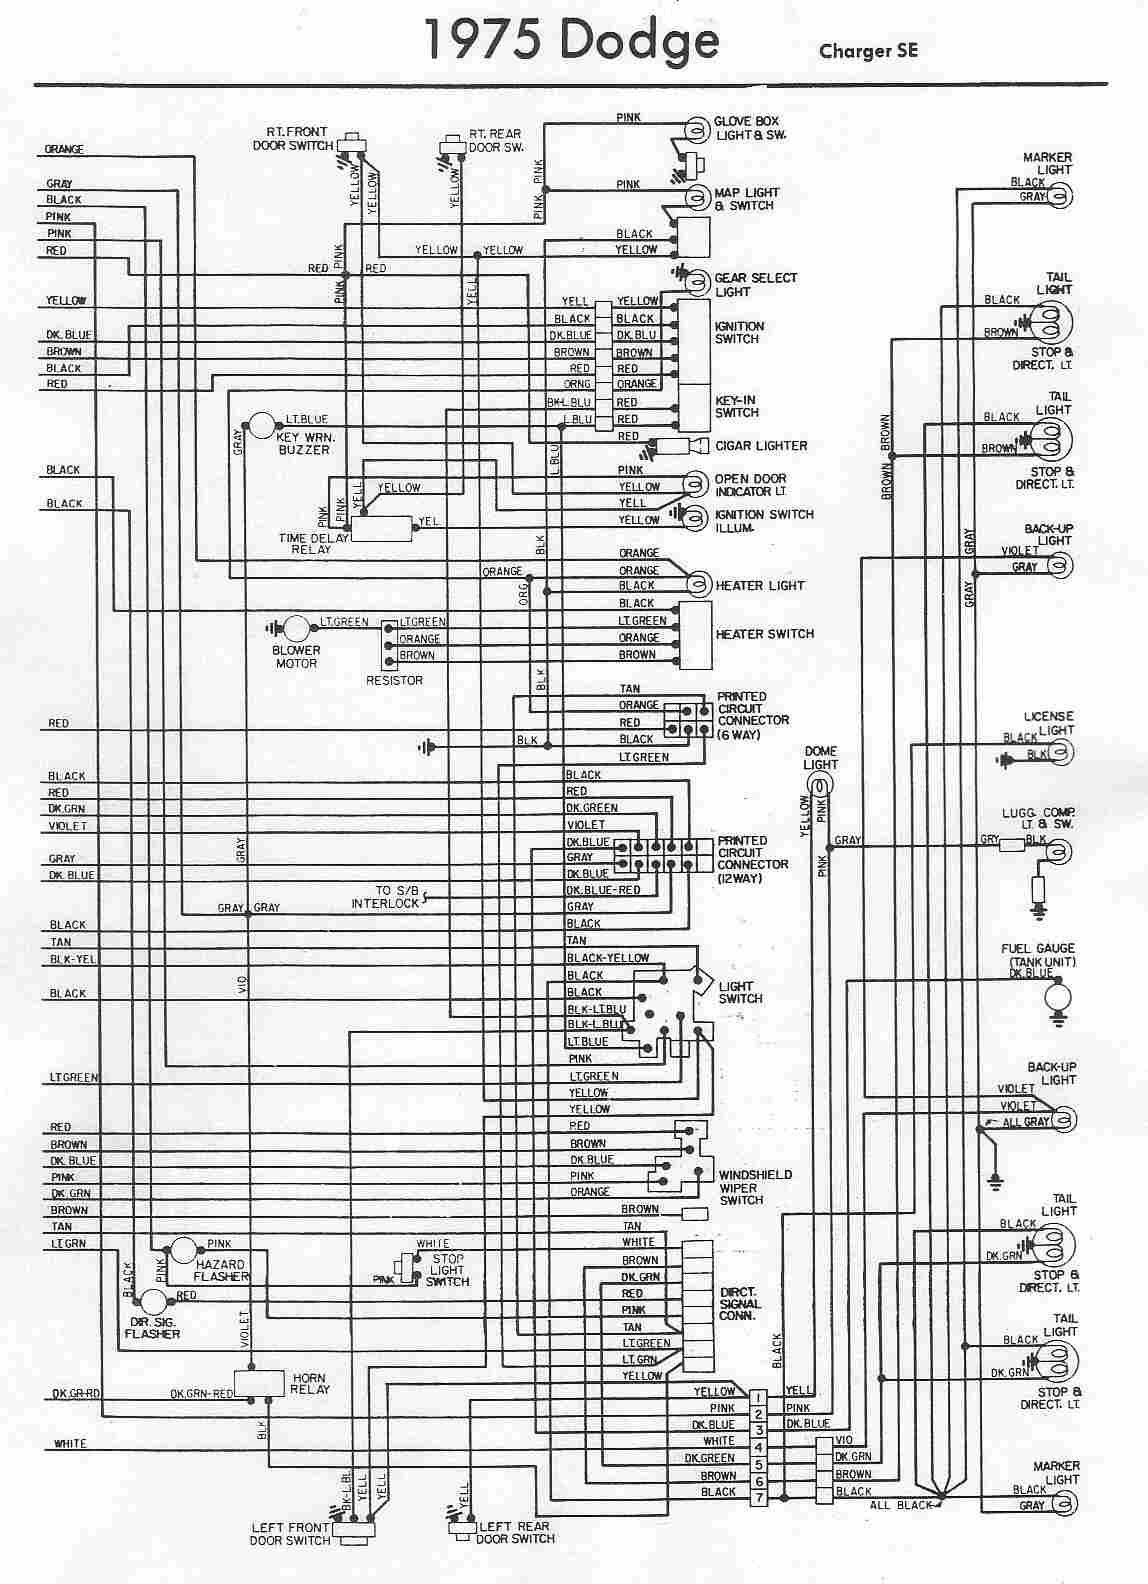 dodge - car pdf manual, wiring diagram & fault codes dtc  automotive-manuals.net